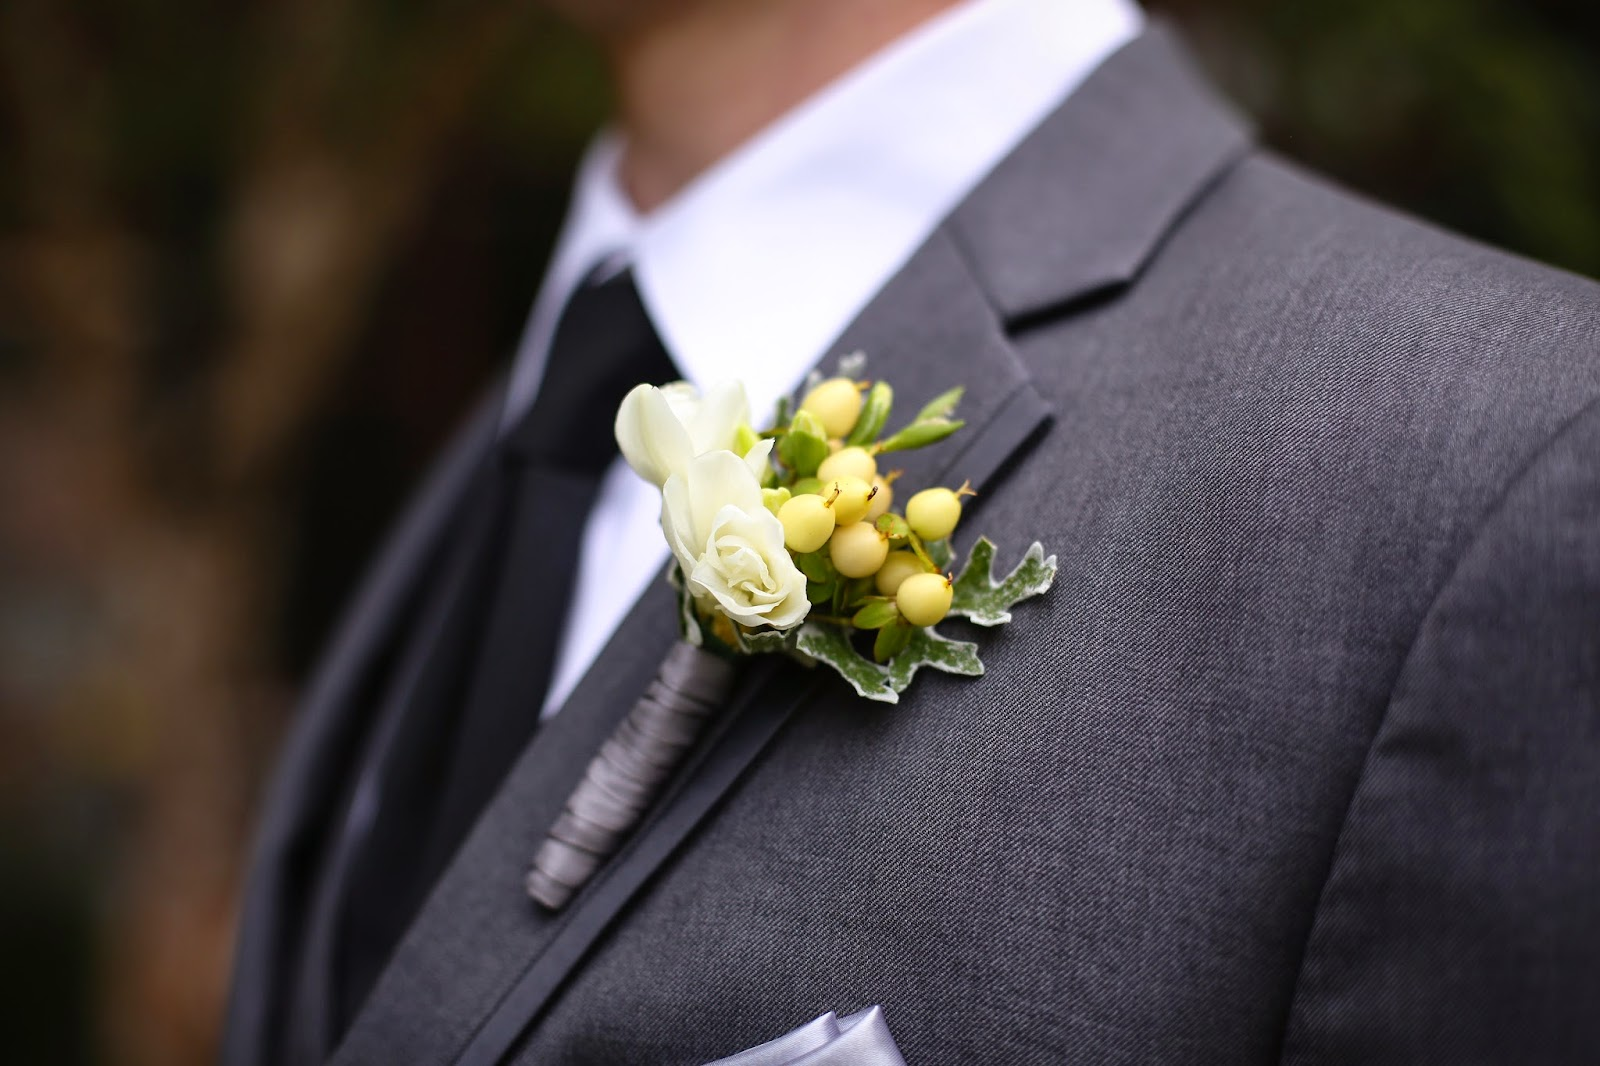 Hypericum Berry Boutonniere - Boutonnieres - Wedding Flowers - Groom - Usher - Best Man - Groomsmen - Ushers - Groom's Boutonniere